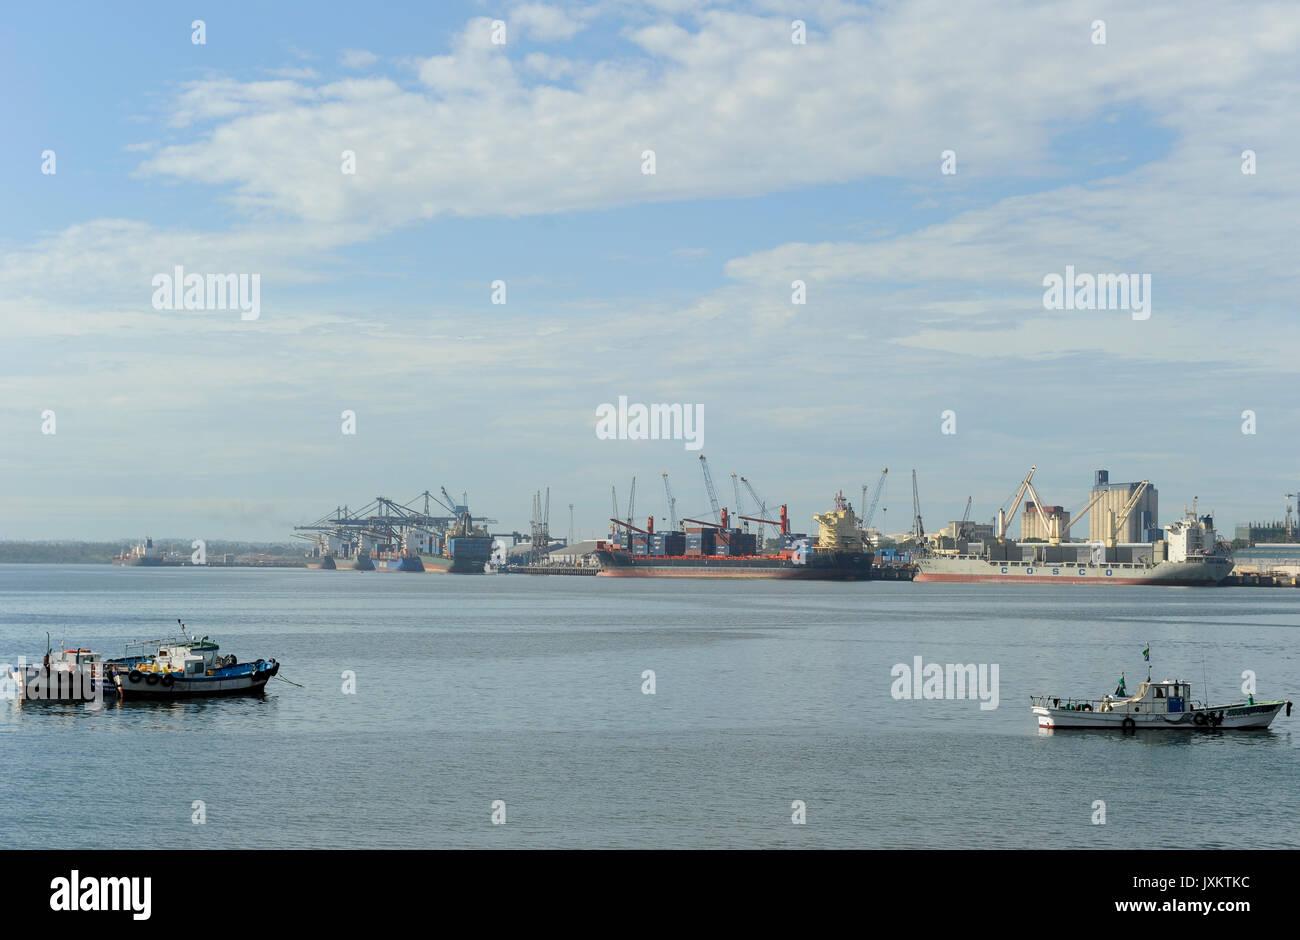 Tanzanie Dar es Salaam , TANZANIE / port de Dar es Salam, Hafen Photo Stock